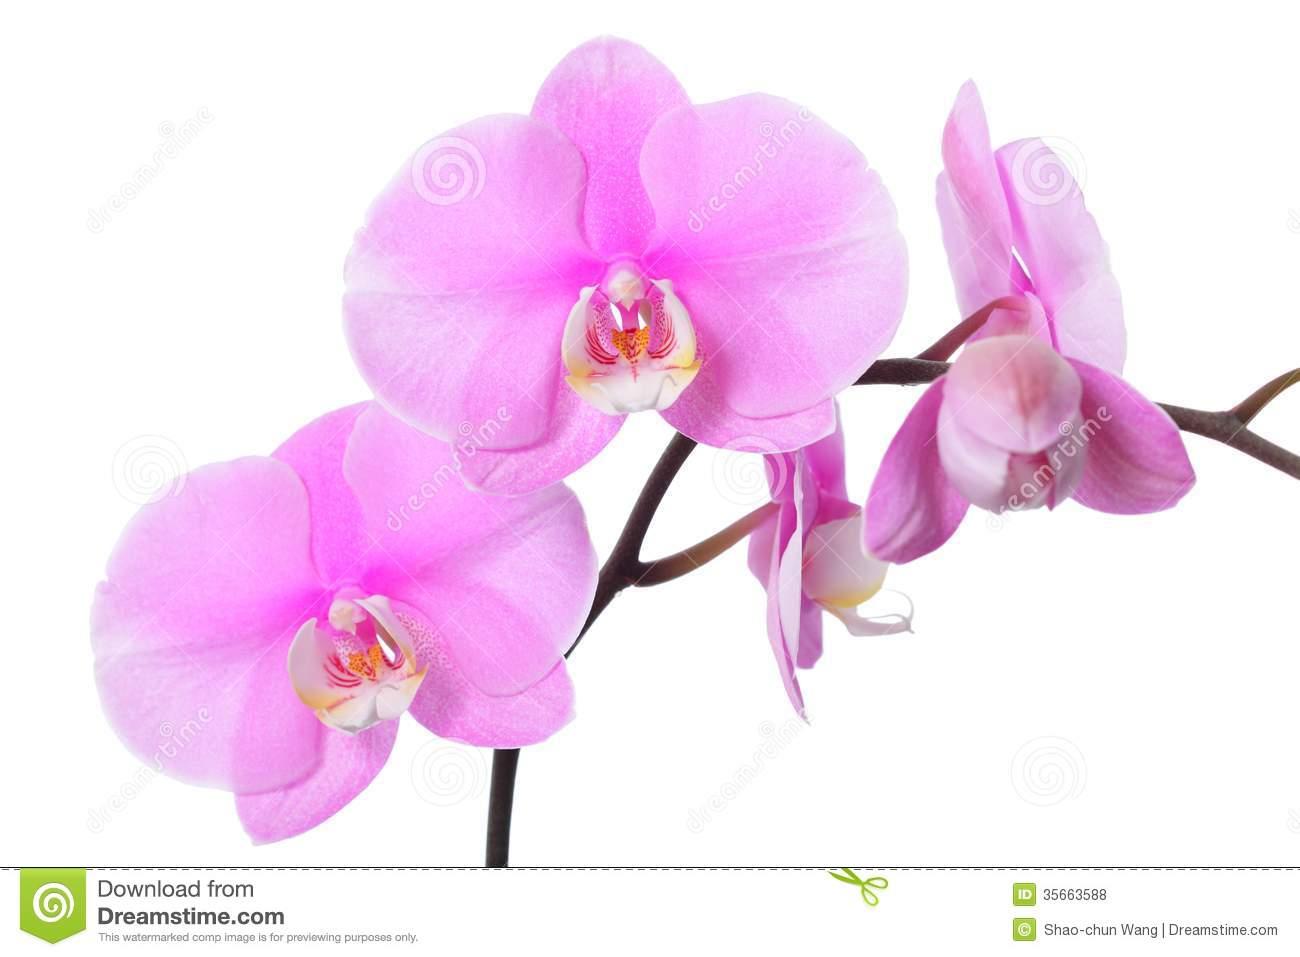 Orchid clipart orchid flower Clip #68 Flower art orchid